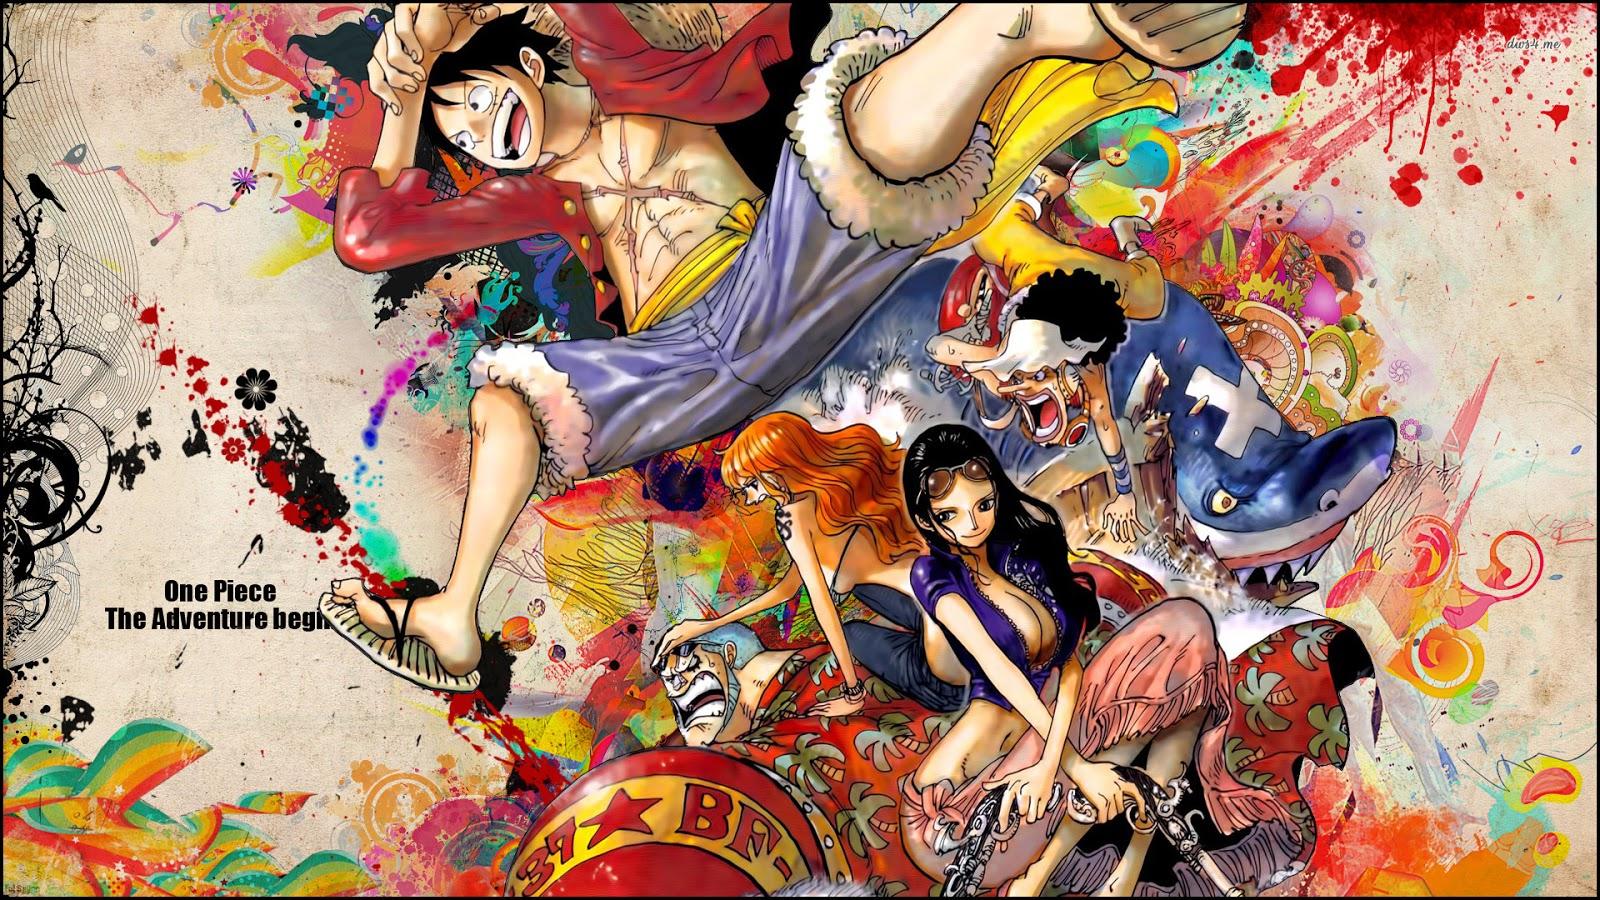 http://4.bp.blogspot.com/-Epzn0wTWEzs/UMi8GJ5bwjI/AAAAAAAACy4/cpNW0s4EbEU/s1600/6071-one-piece-1920x1080-anime-wallpaper.jpg